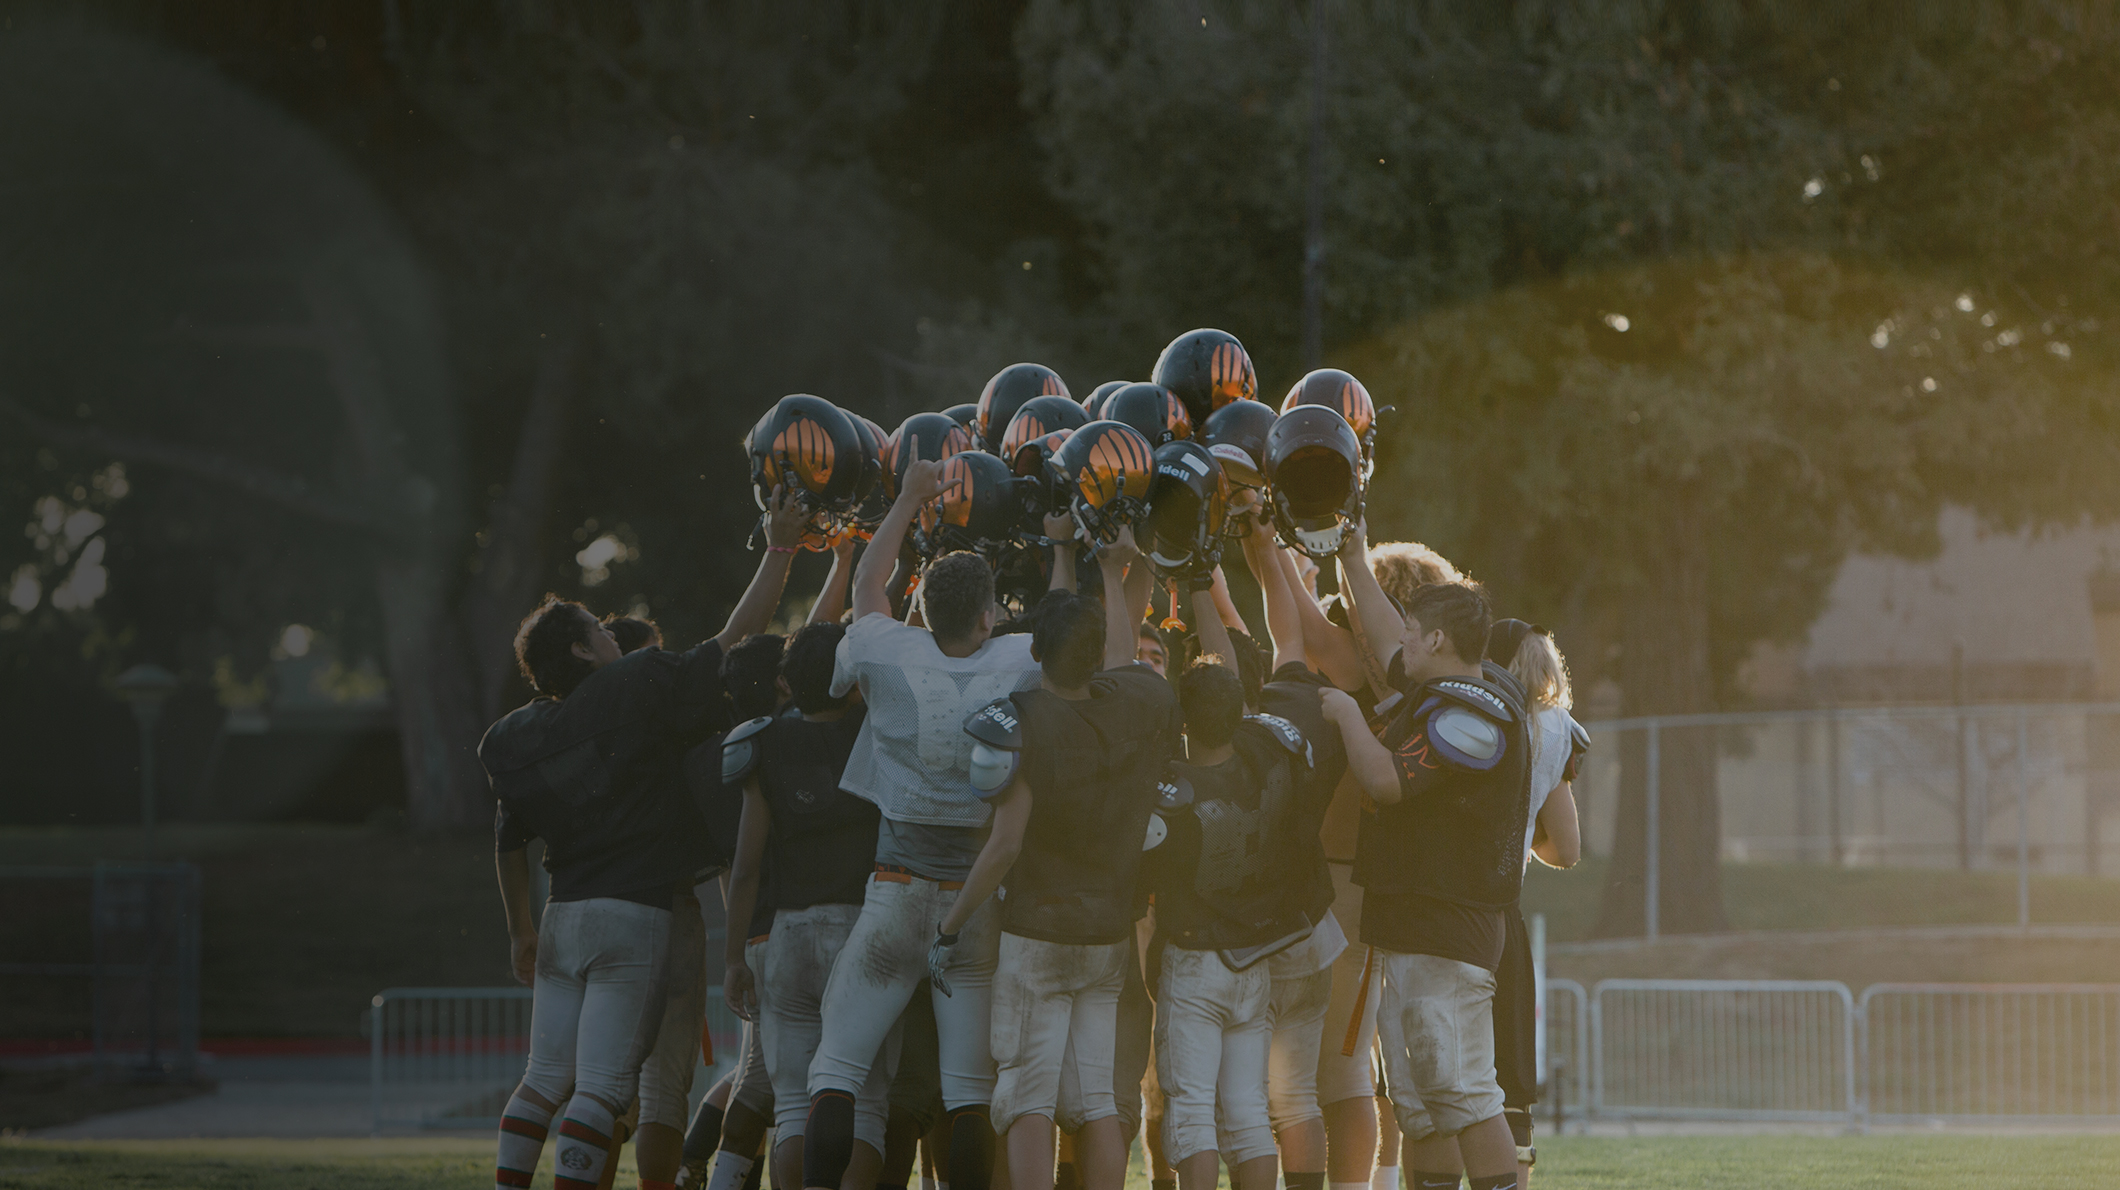 The CSD Eagles football team raises its helmets in the air